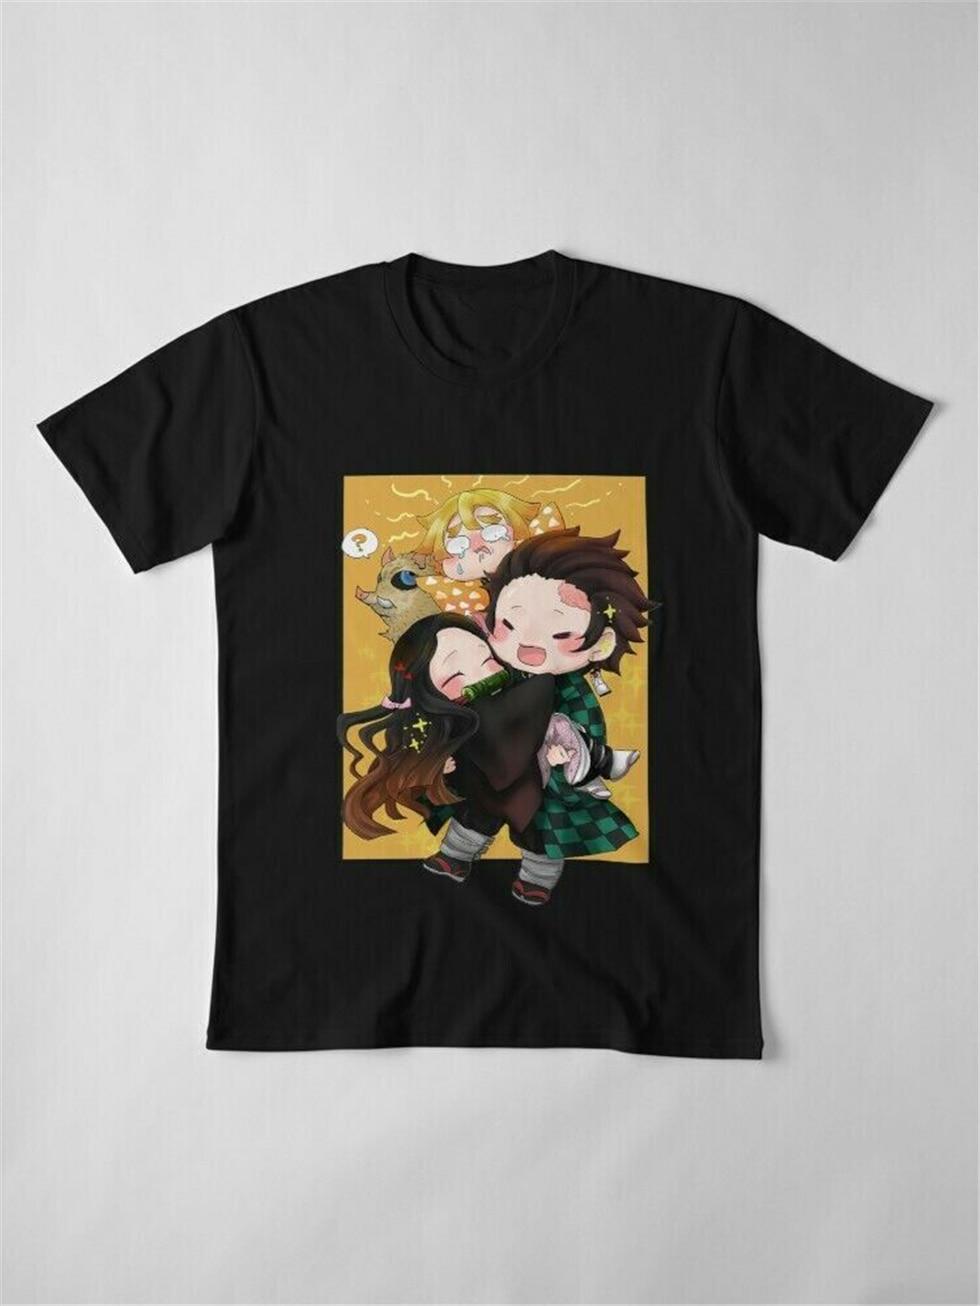 Kimetsu No Yaiba Chibi lindo demonio Slayer Tanjiro Nezuko Inosuke camiseta negra ropa deportiva camiseta